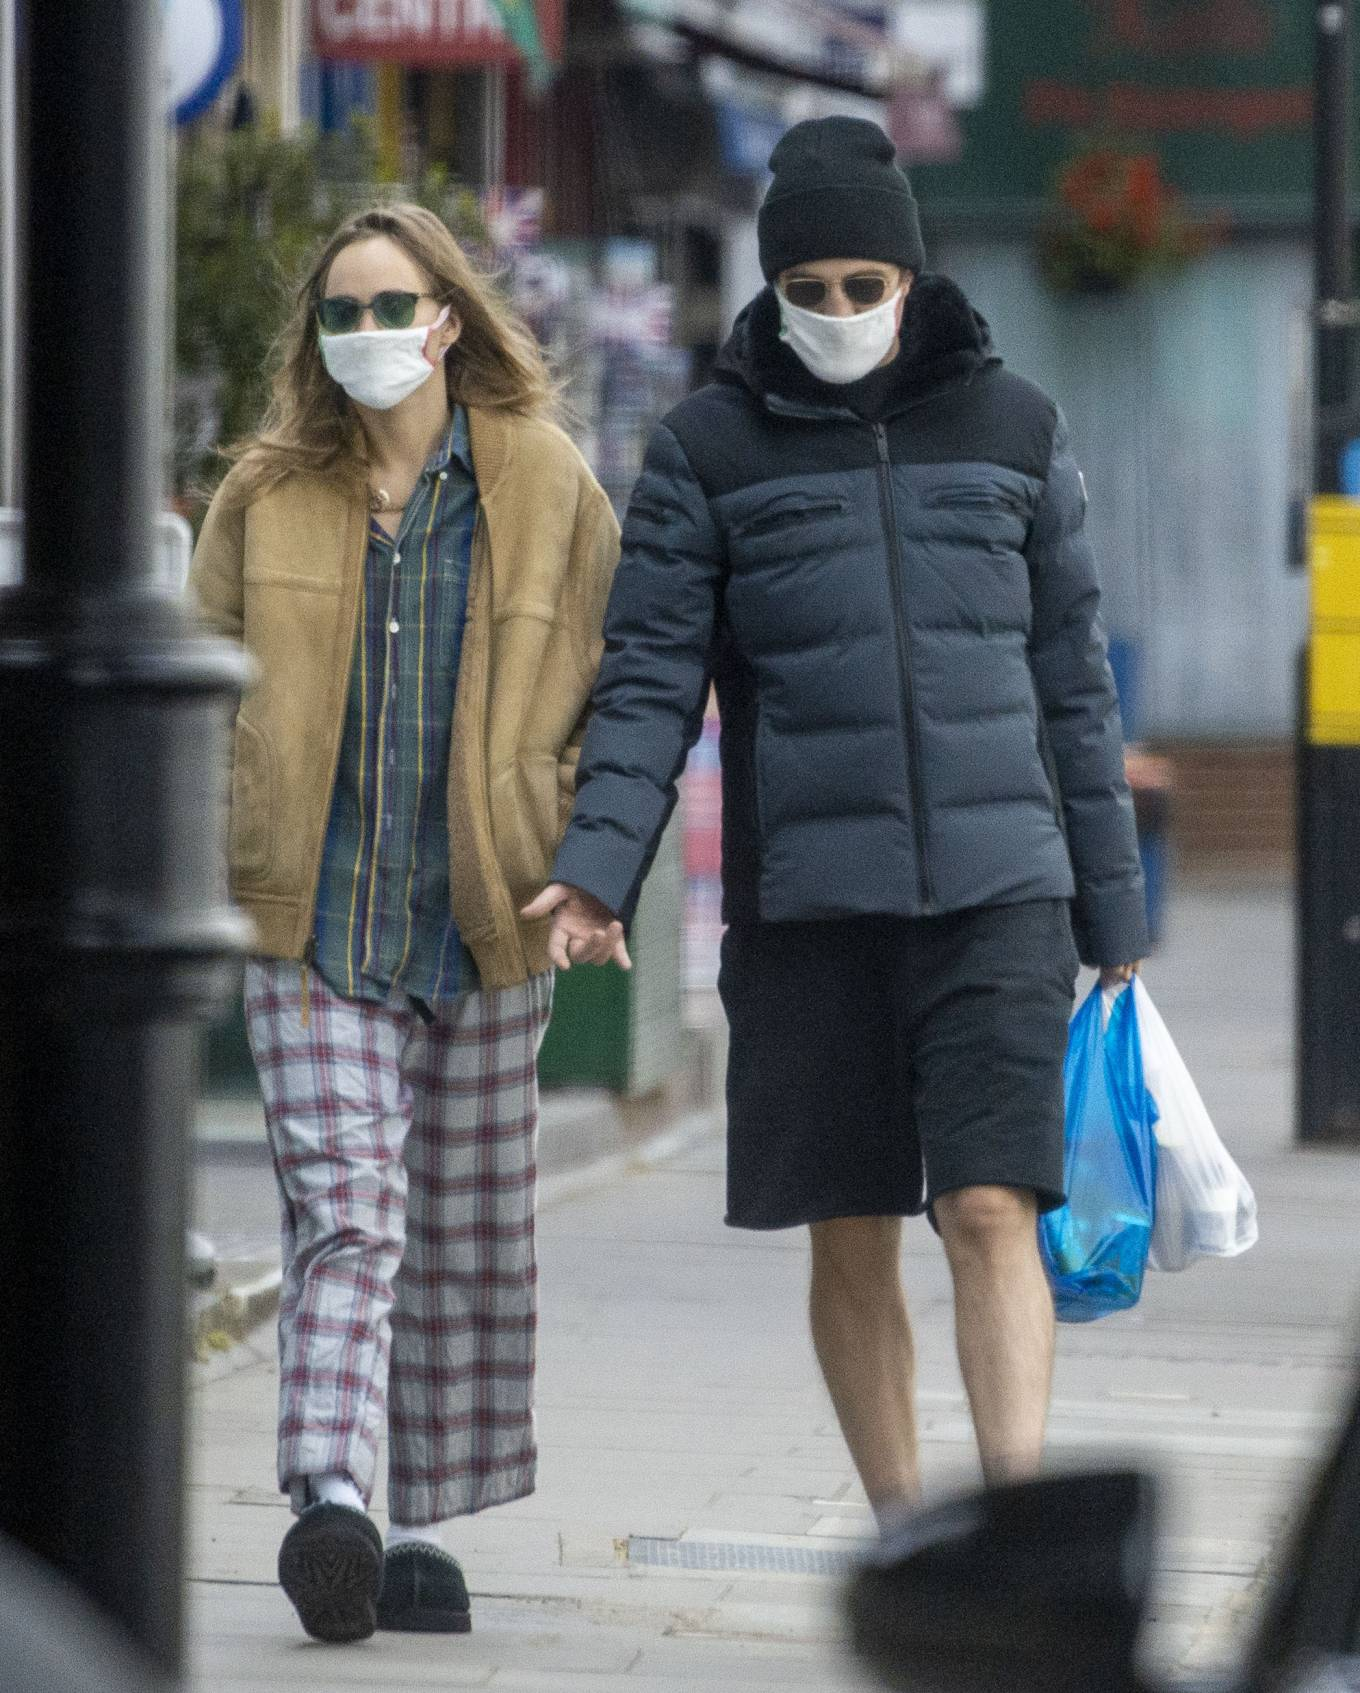 Suki Waterhouse 2020 : Suki Waterhouse and Robert Pattinson – Wearing matching face masks in London-02